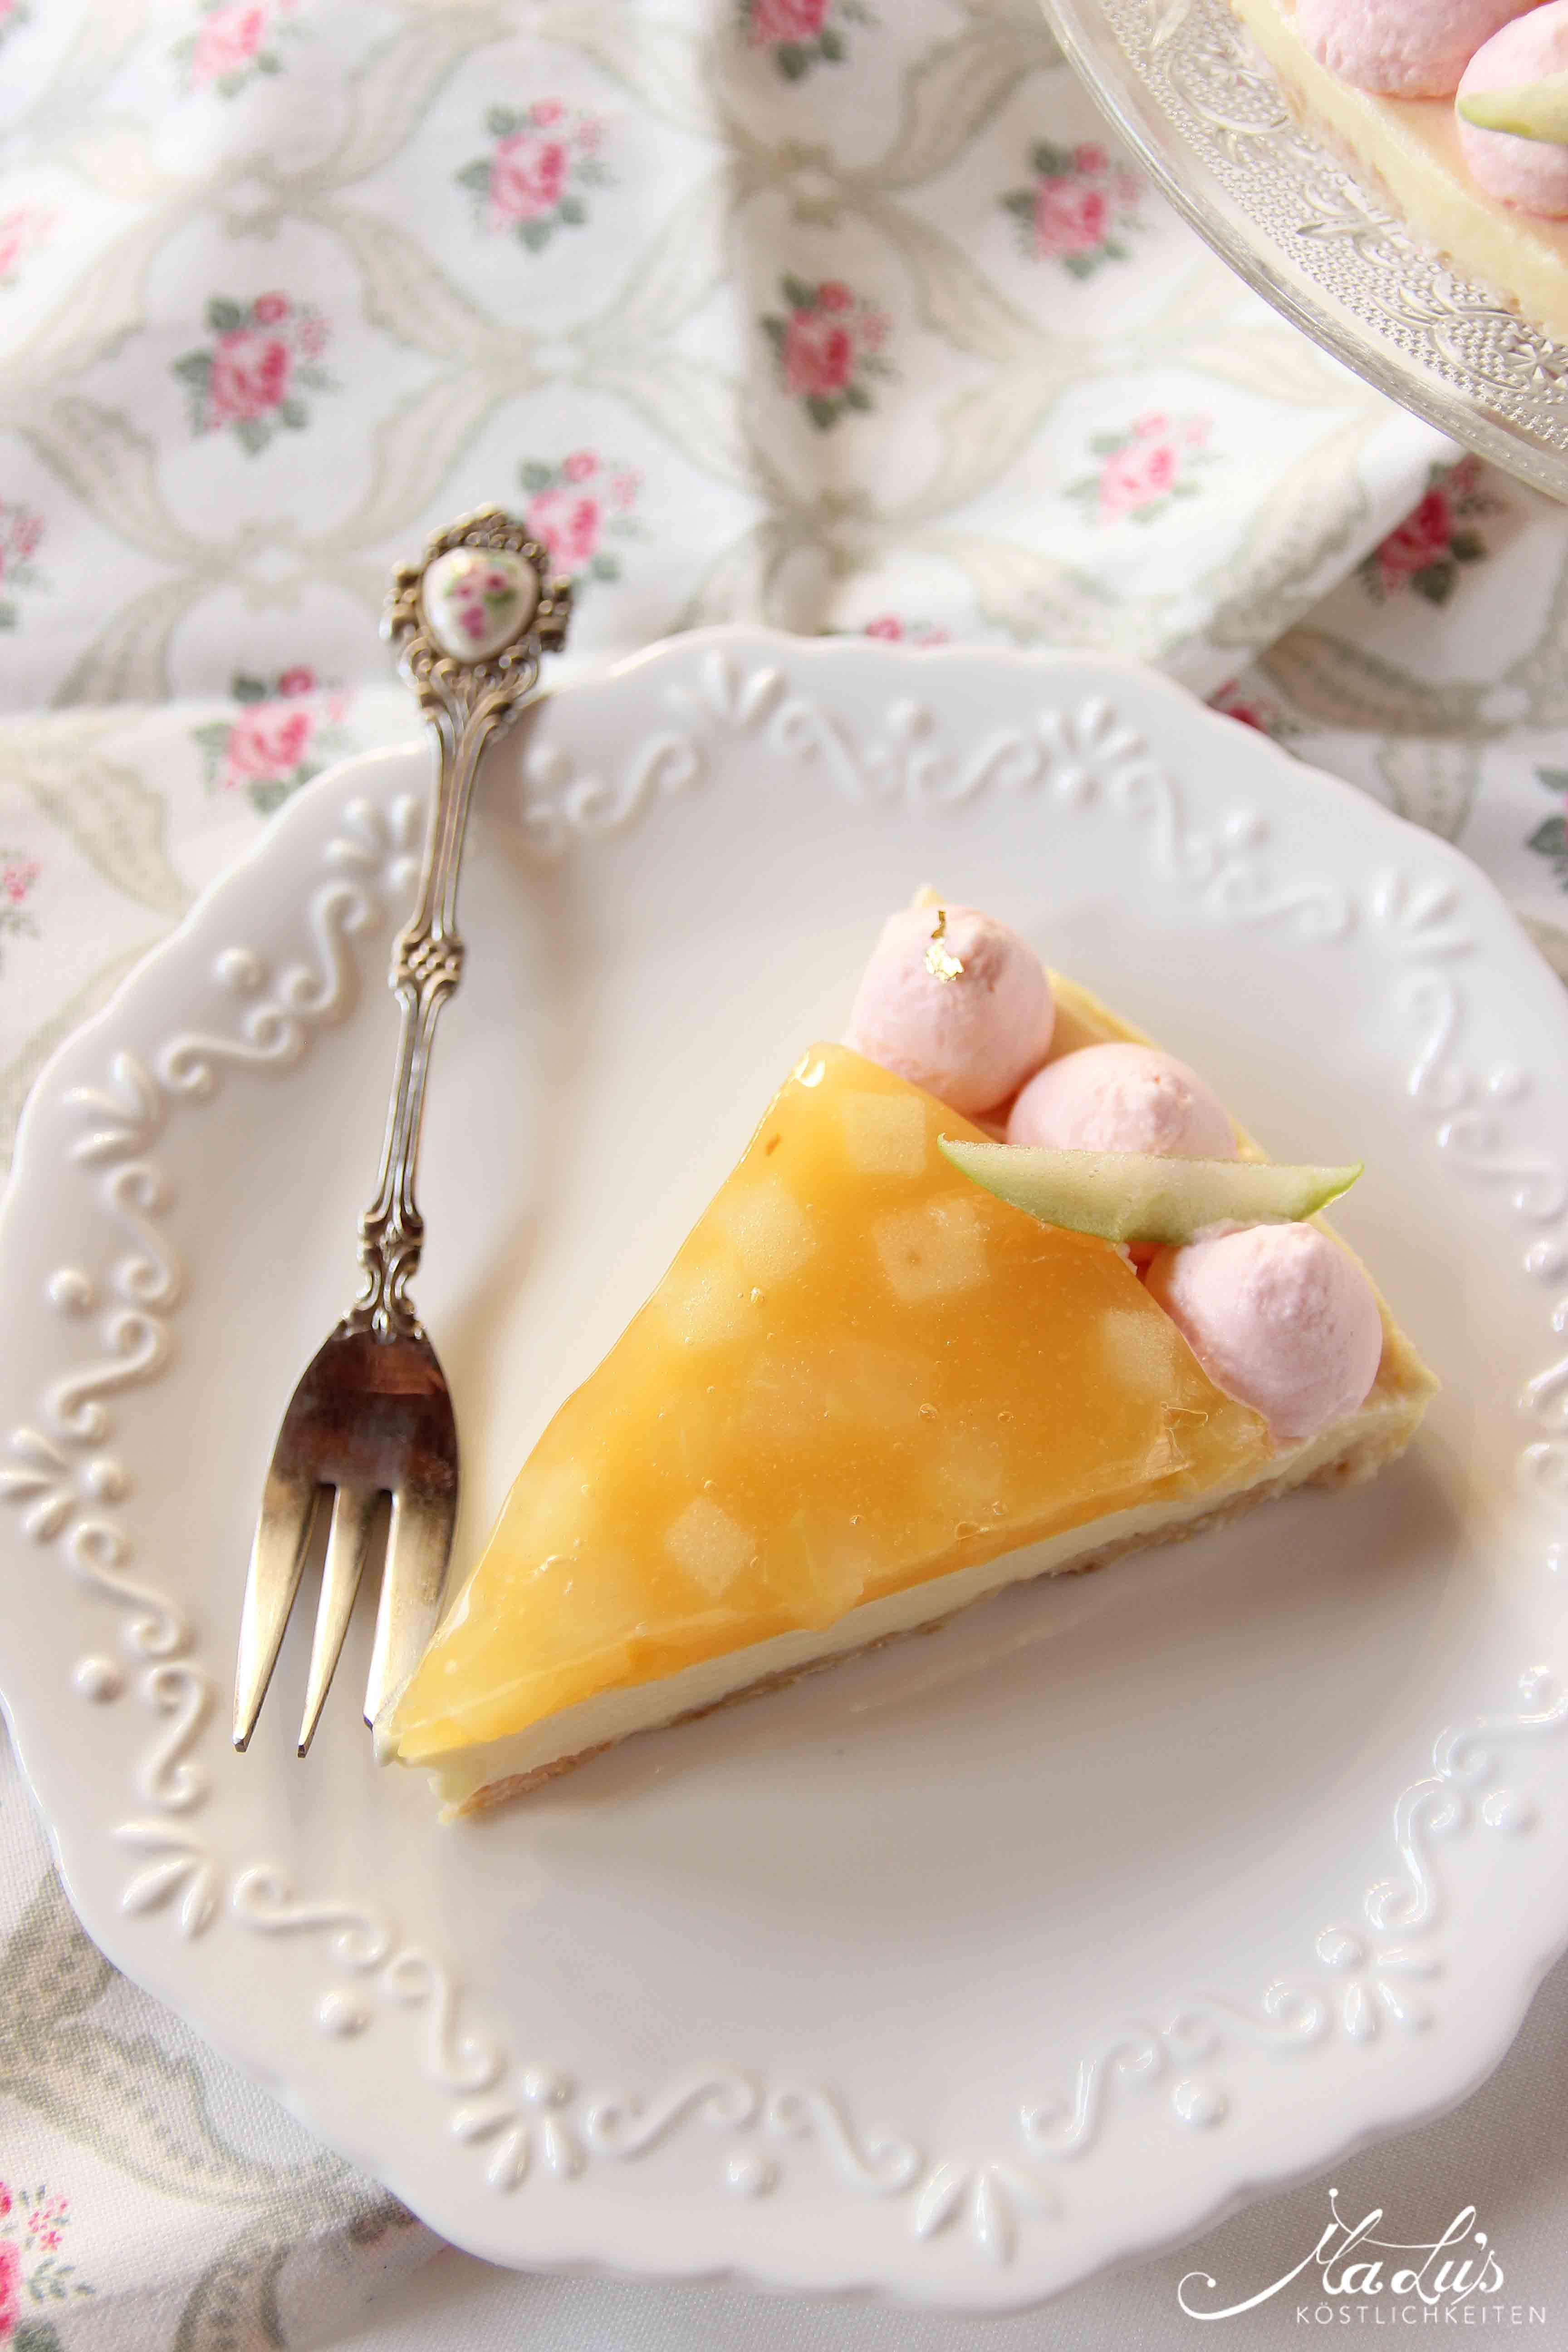 Fantastik Cheesecake Apfel – Quitte